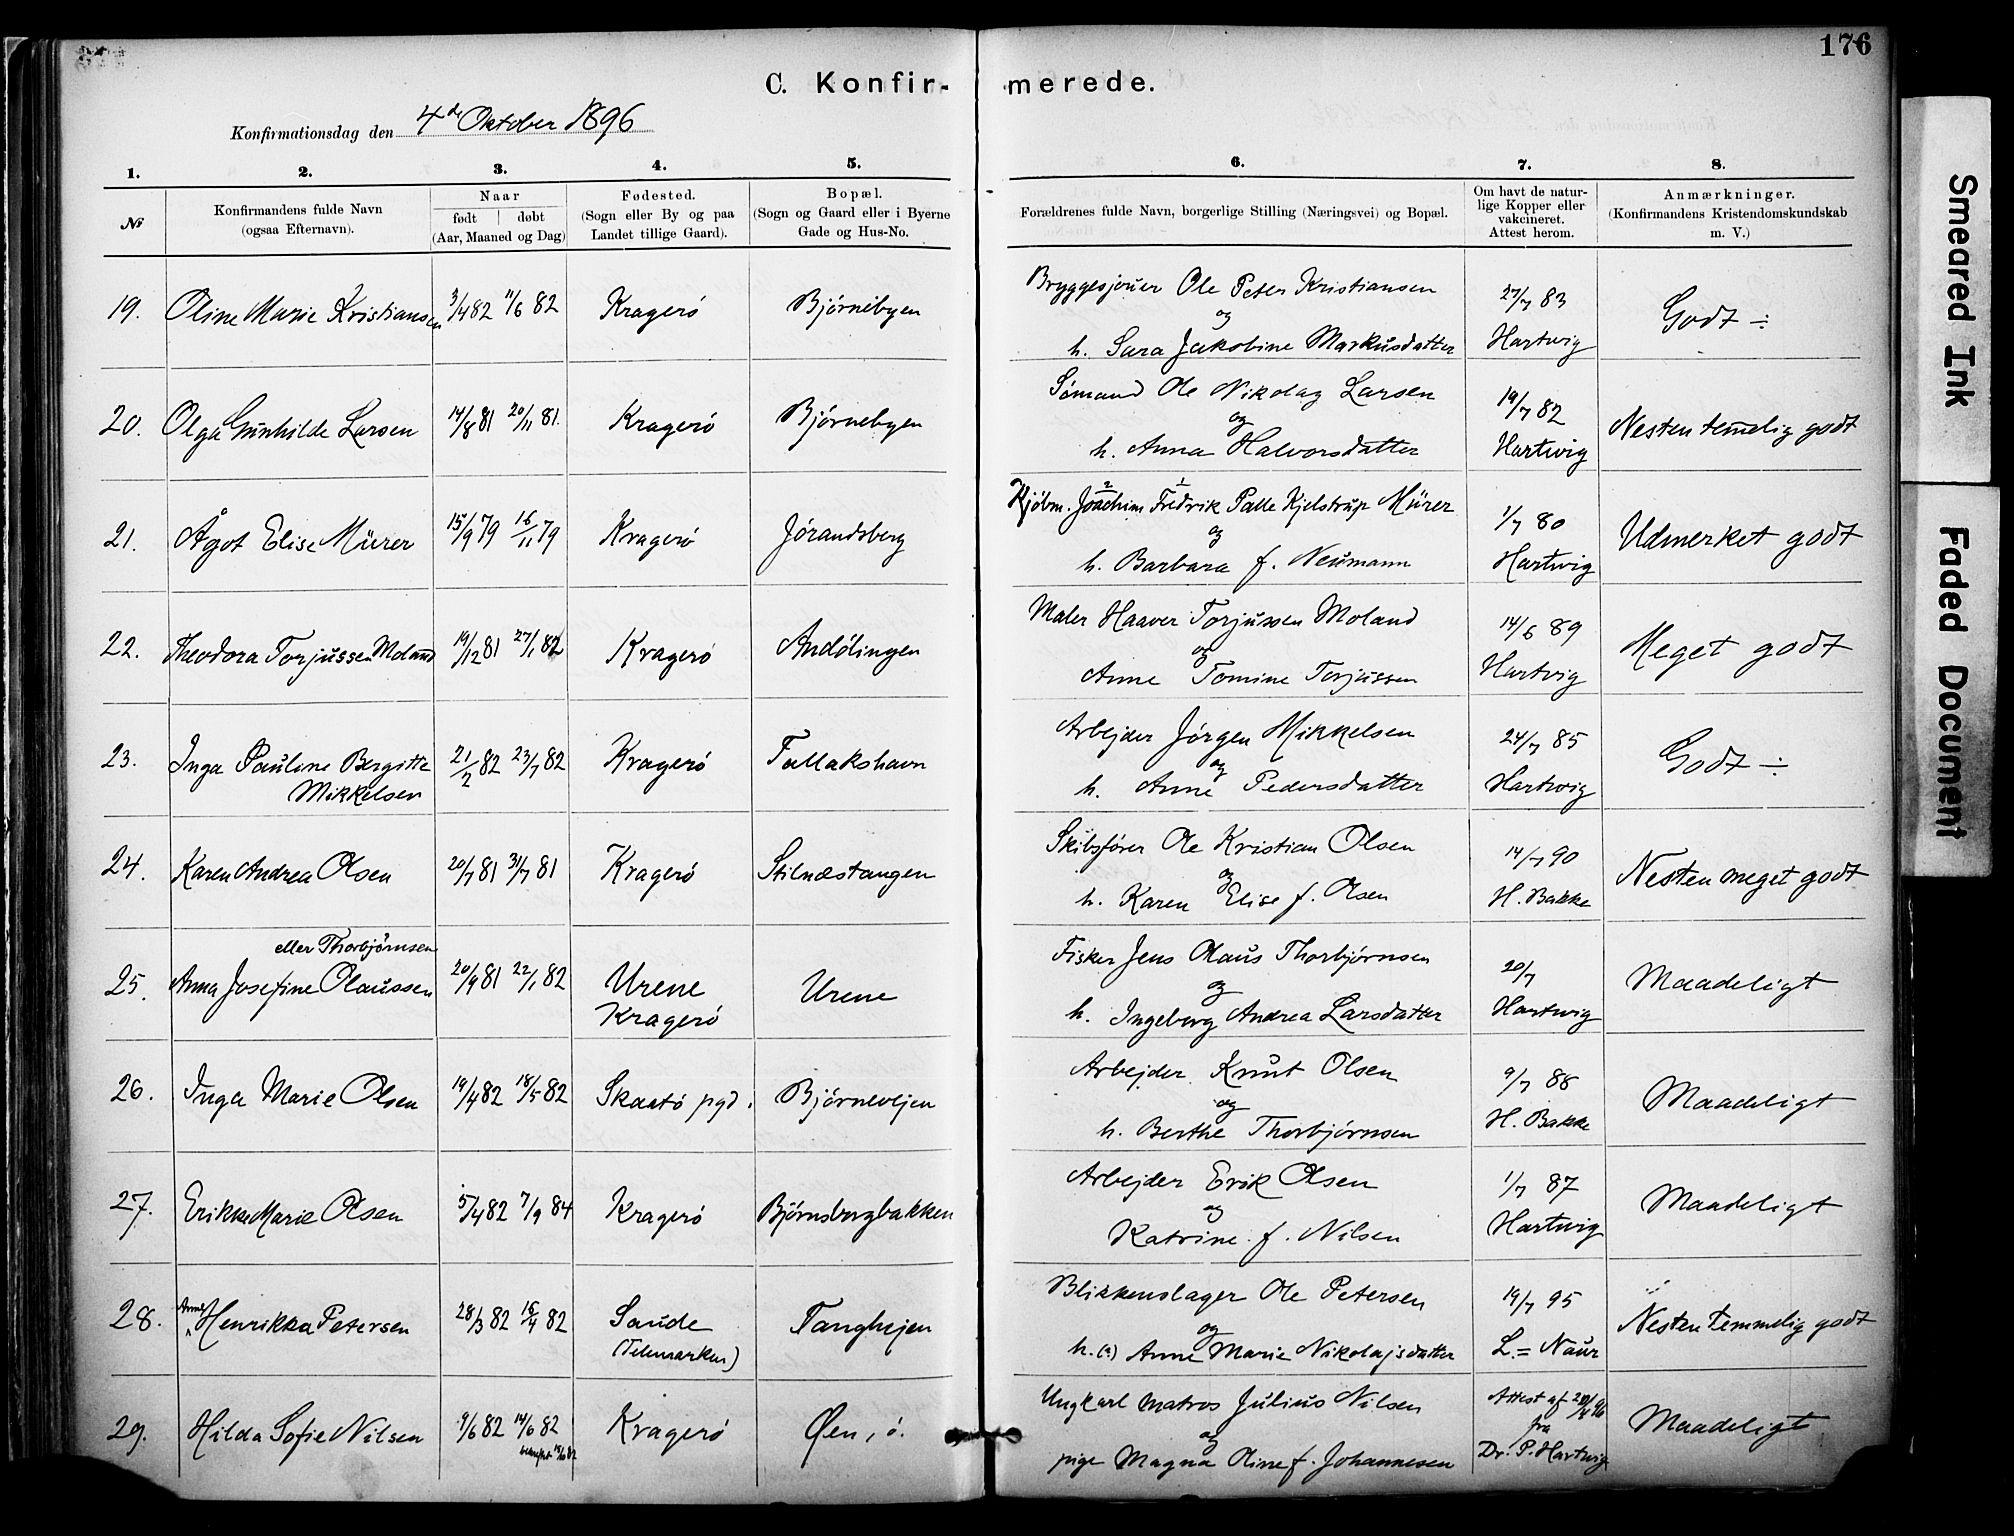 SAKO, Kragerø kirkebøker, F/Fa/L0012: Ministerialbok nr. I 12, 1880-1904, s. 176